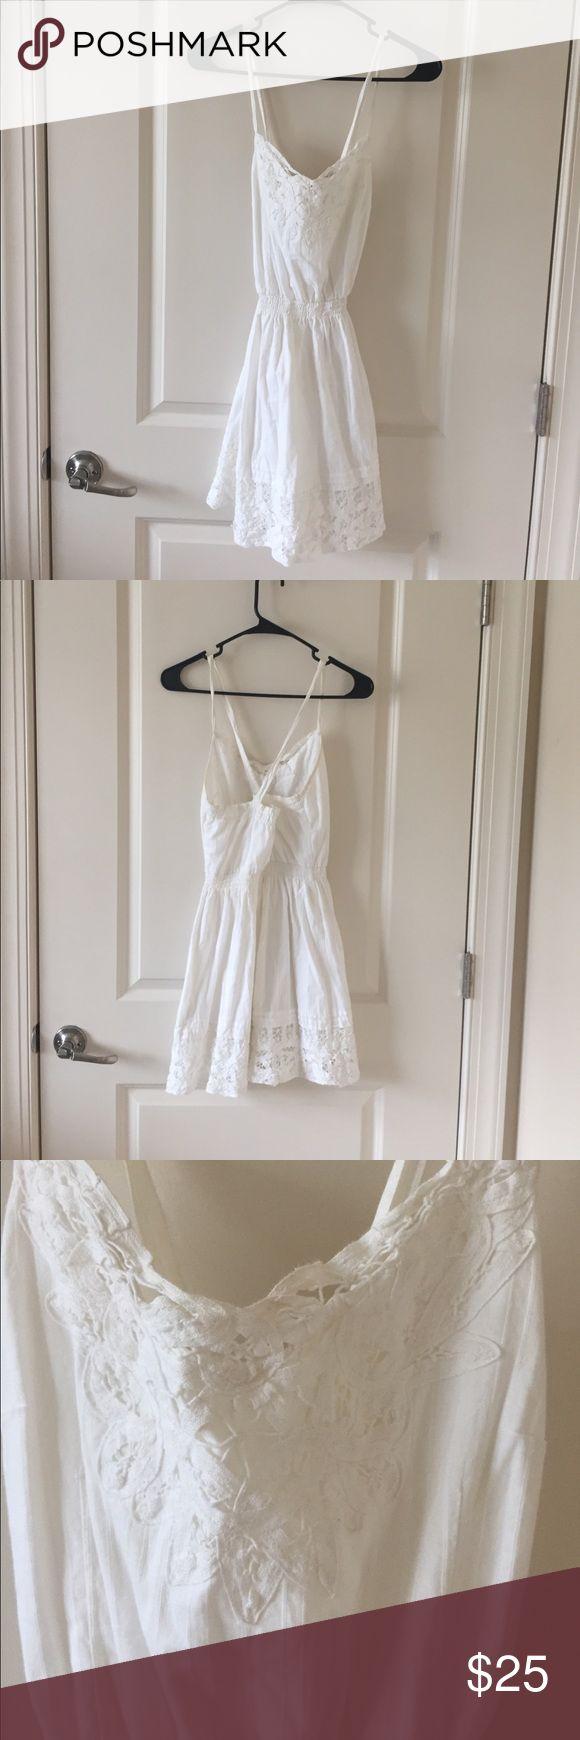 White Crotchet Hollister dress White crotchet Hollister dress, women's size small, normal use, good condition slight discoloring on straps. Hollister Dresses Mini